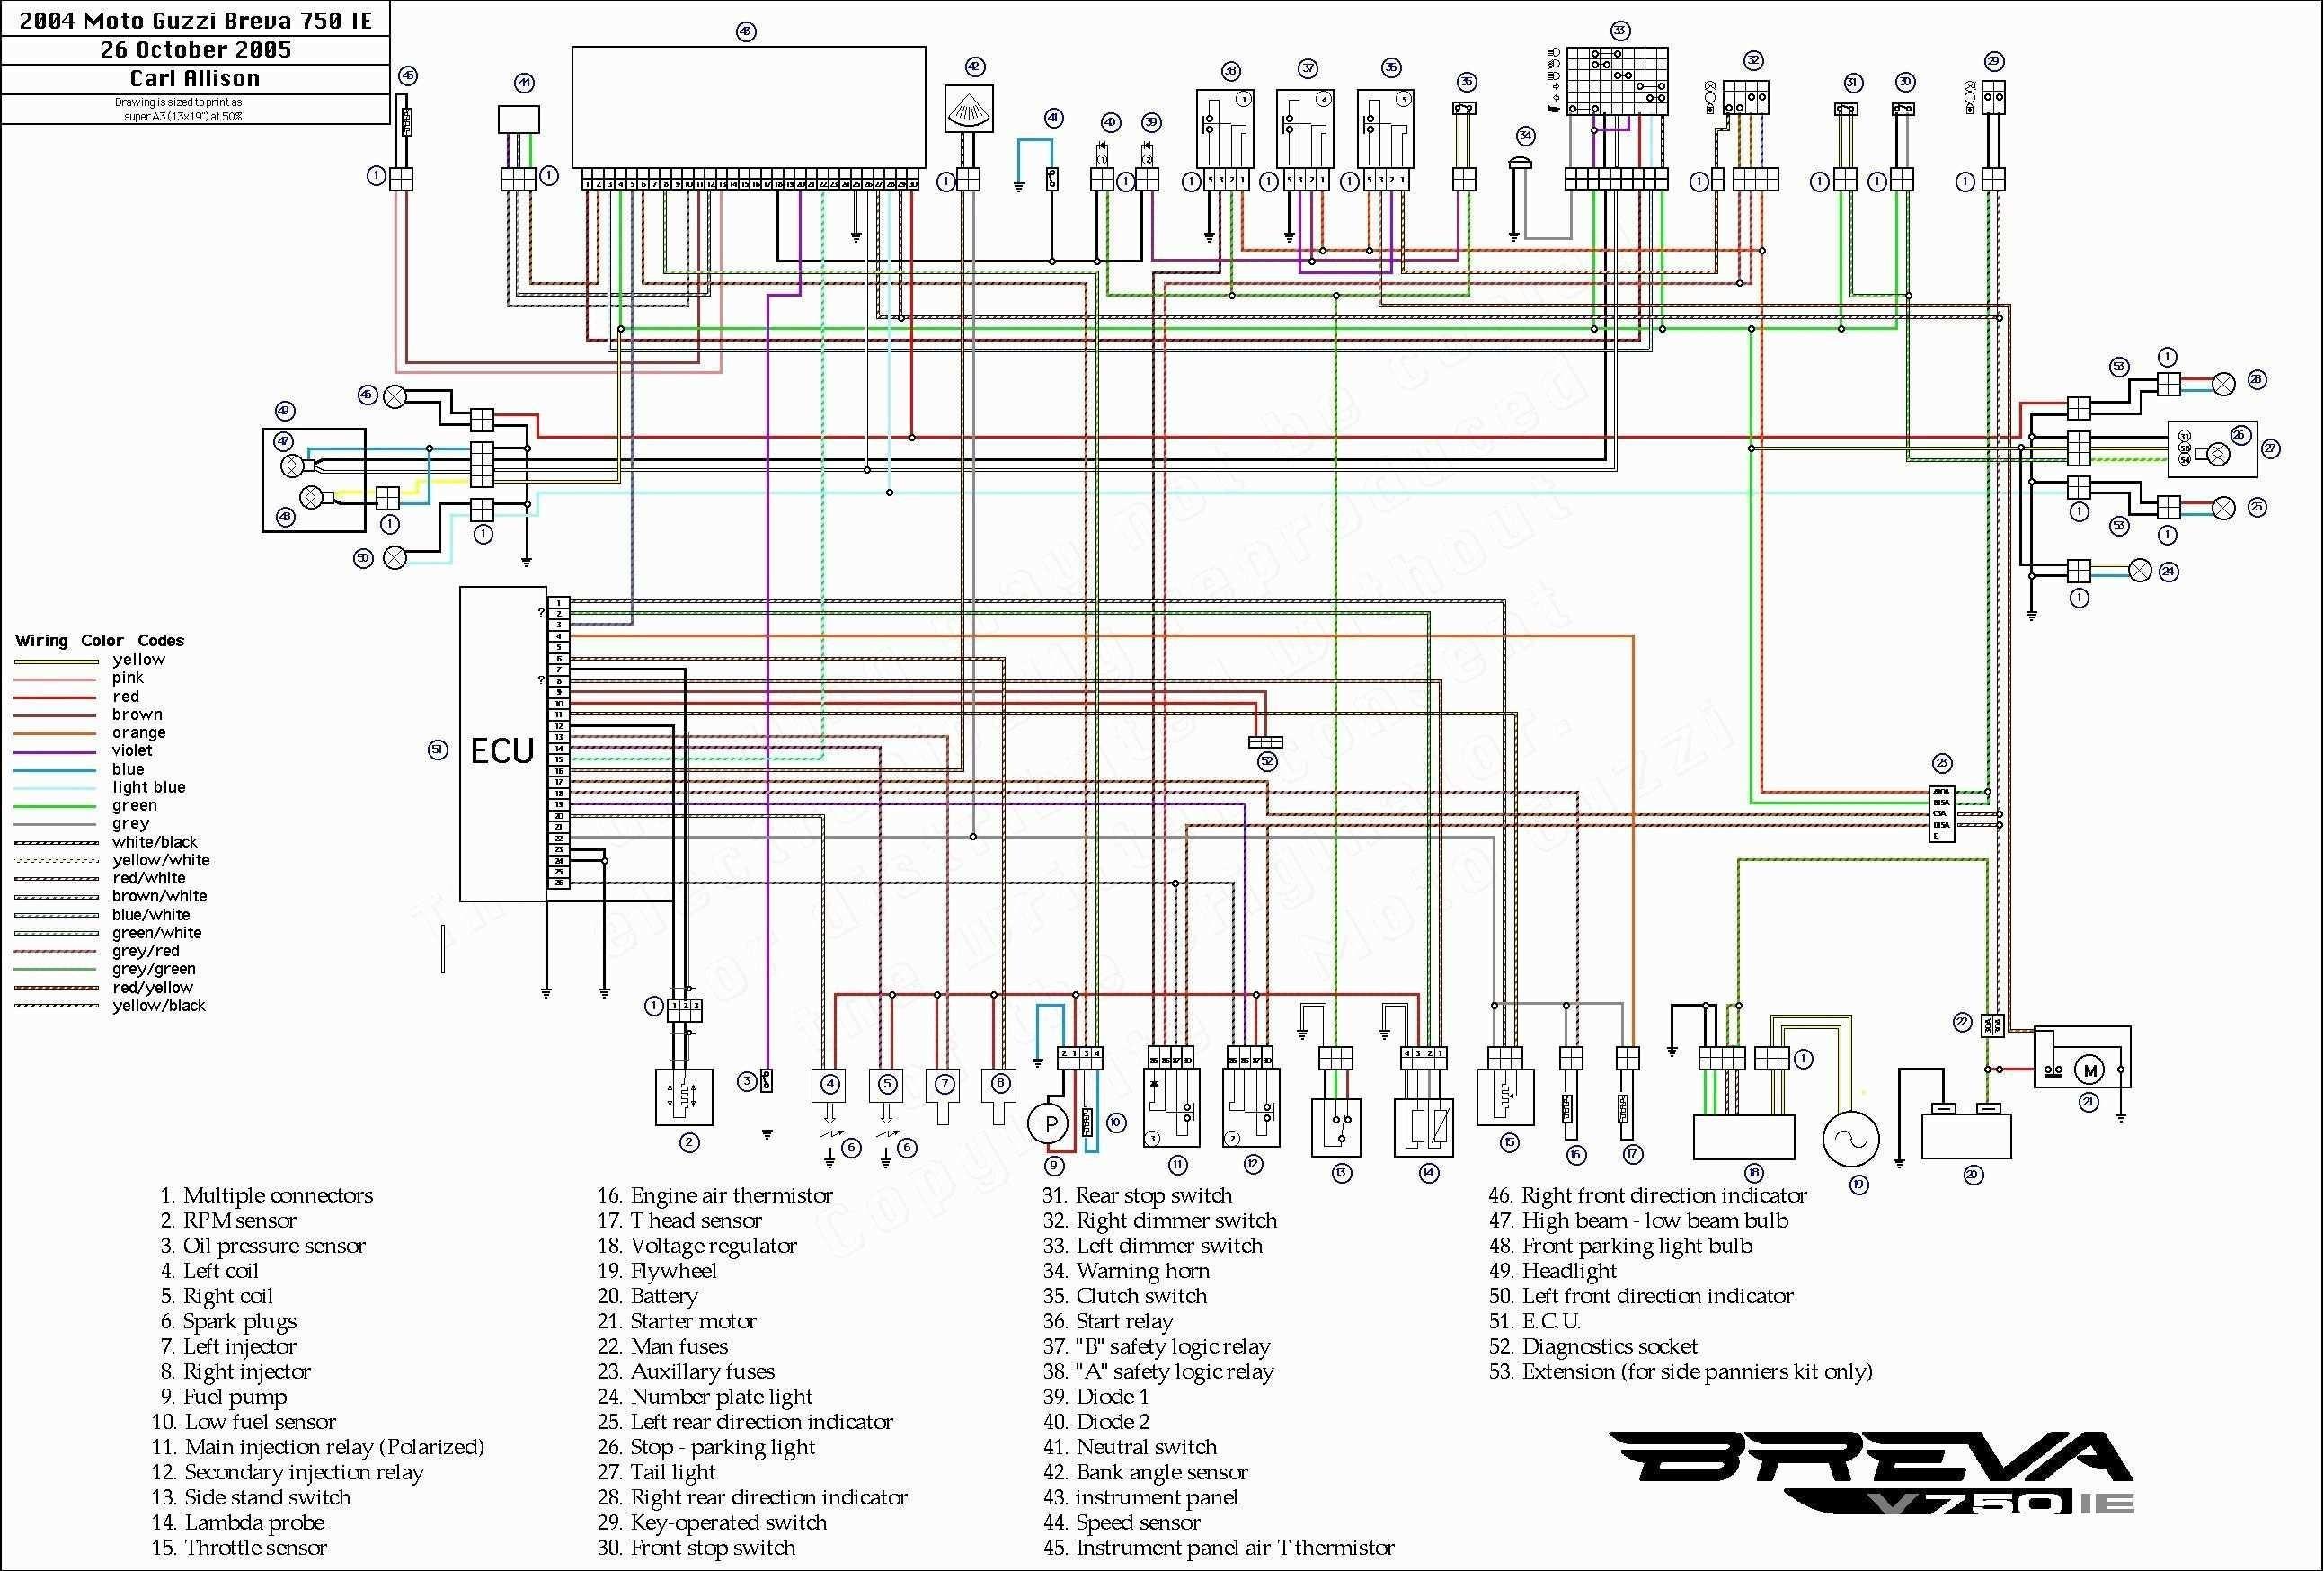 2001 Dodge Caravan Engine Diagram 1999 Dodge Caravan Engine Diagram Wiring Diagram Used Of 2001 Dodge Caravan Engine Diagram